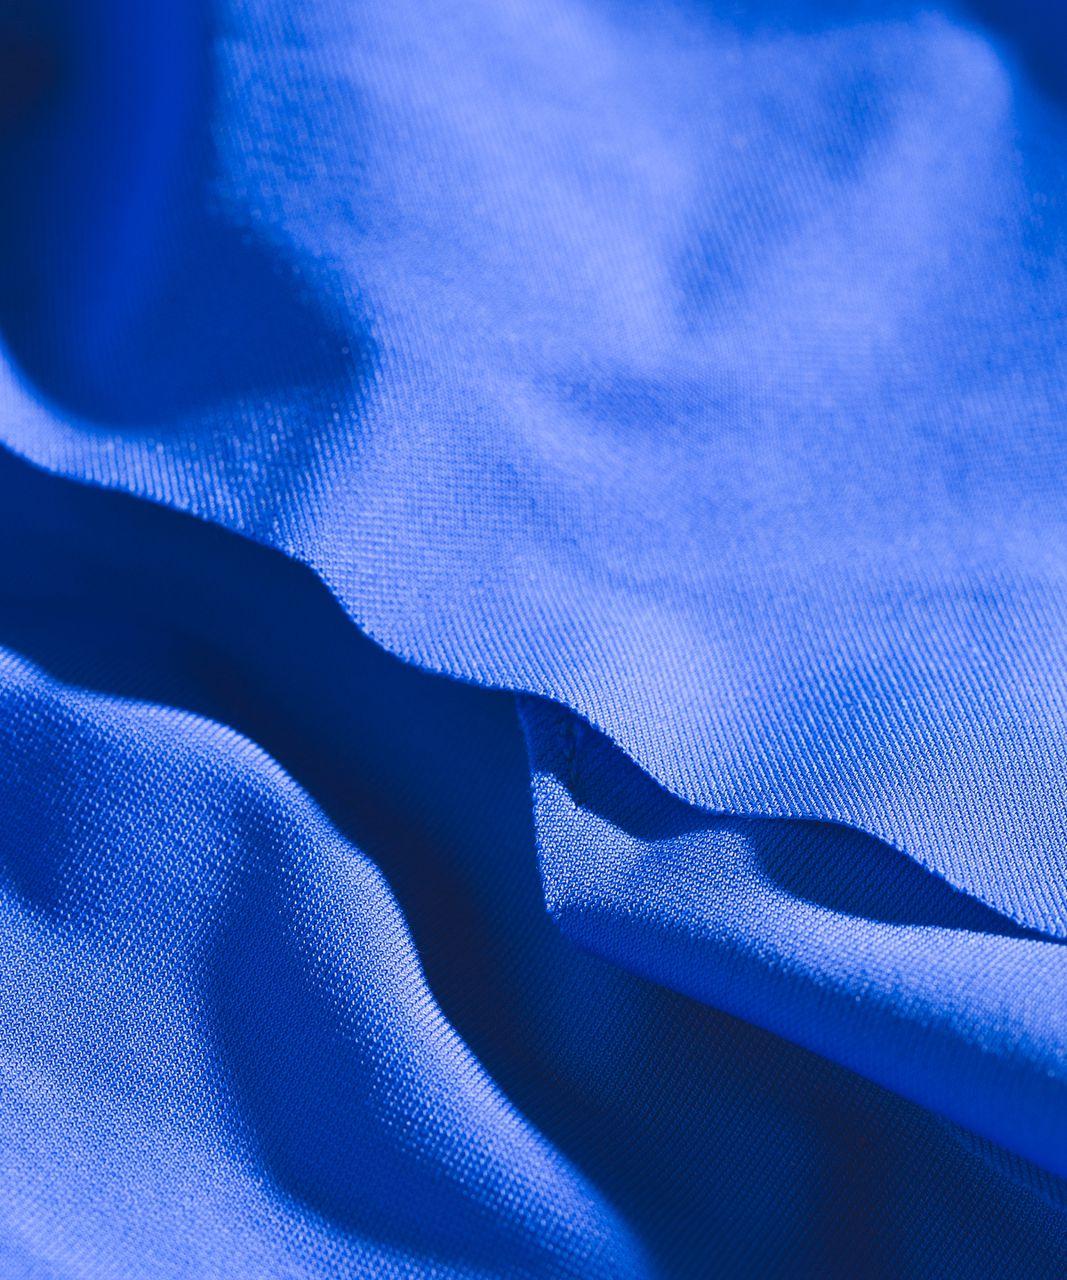 Lululemon Namastay Put Hipster - Cerulean Blue